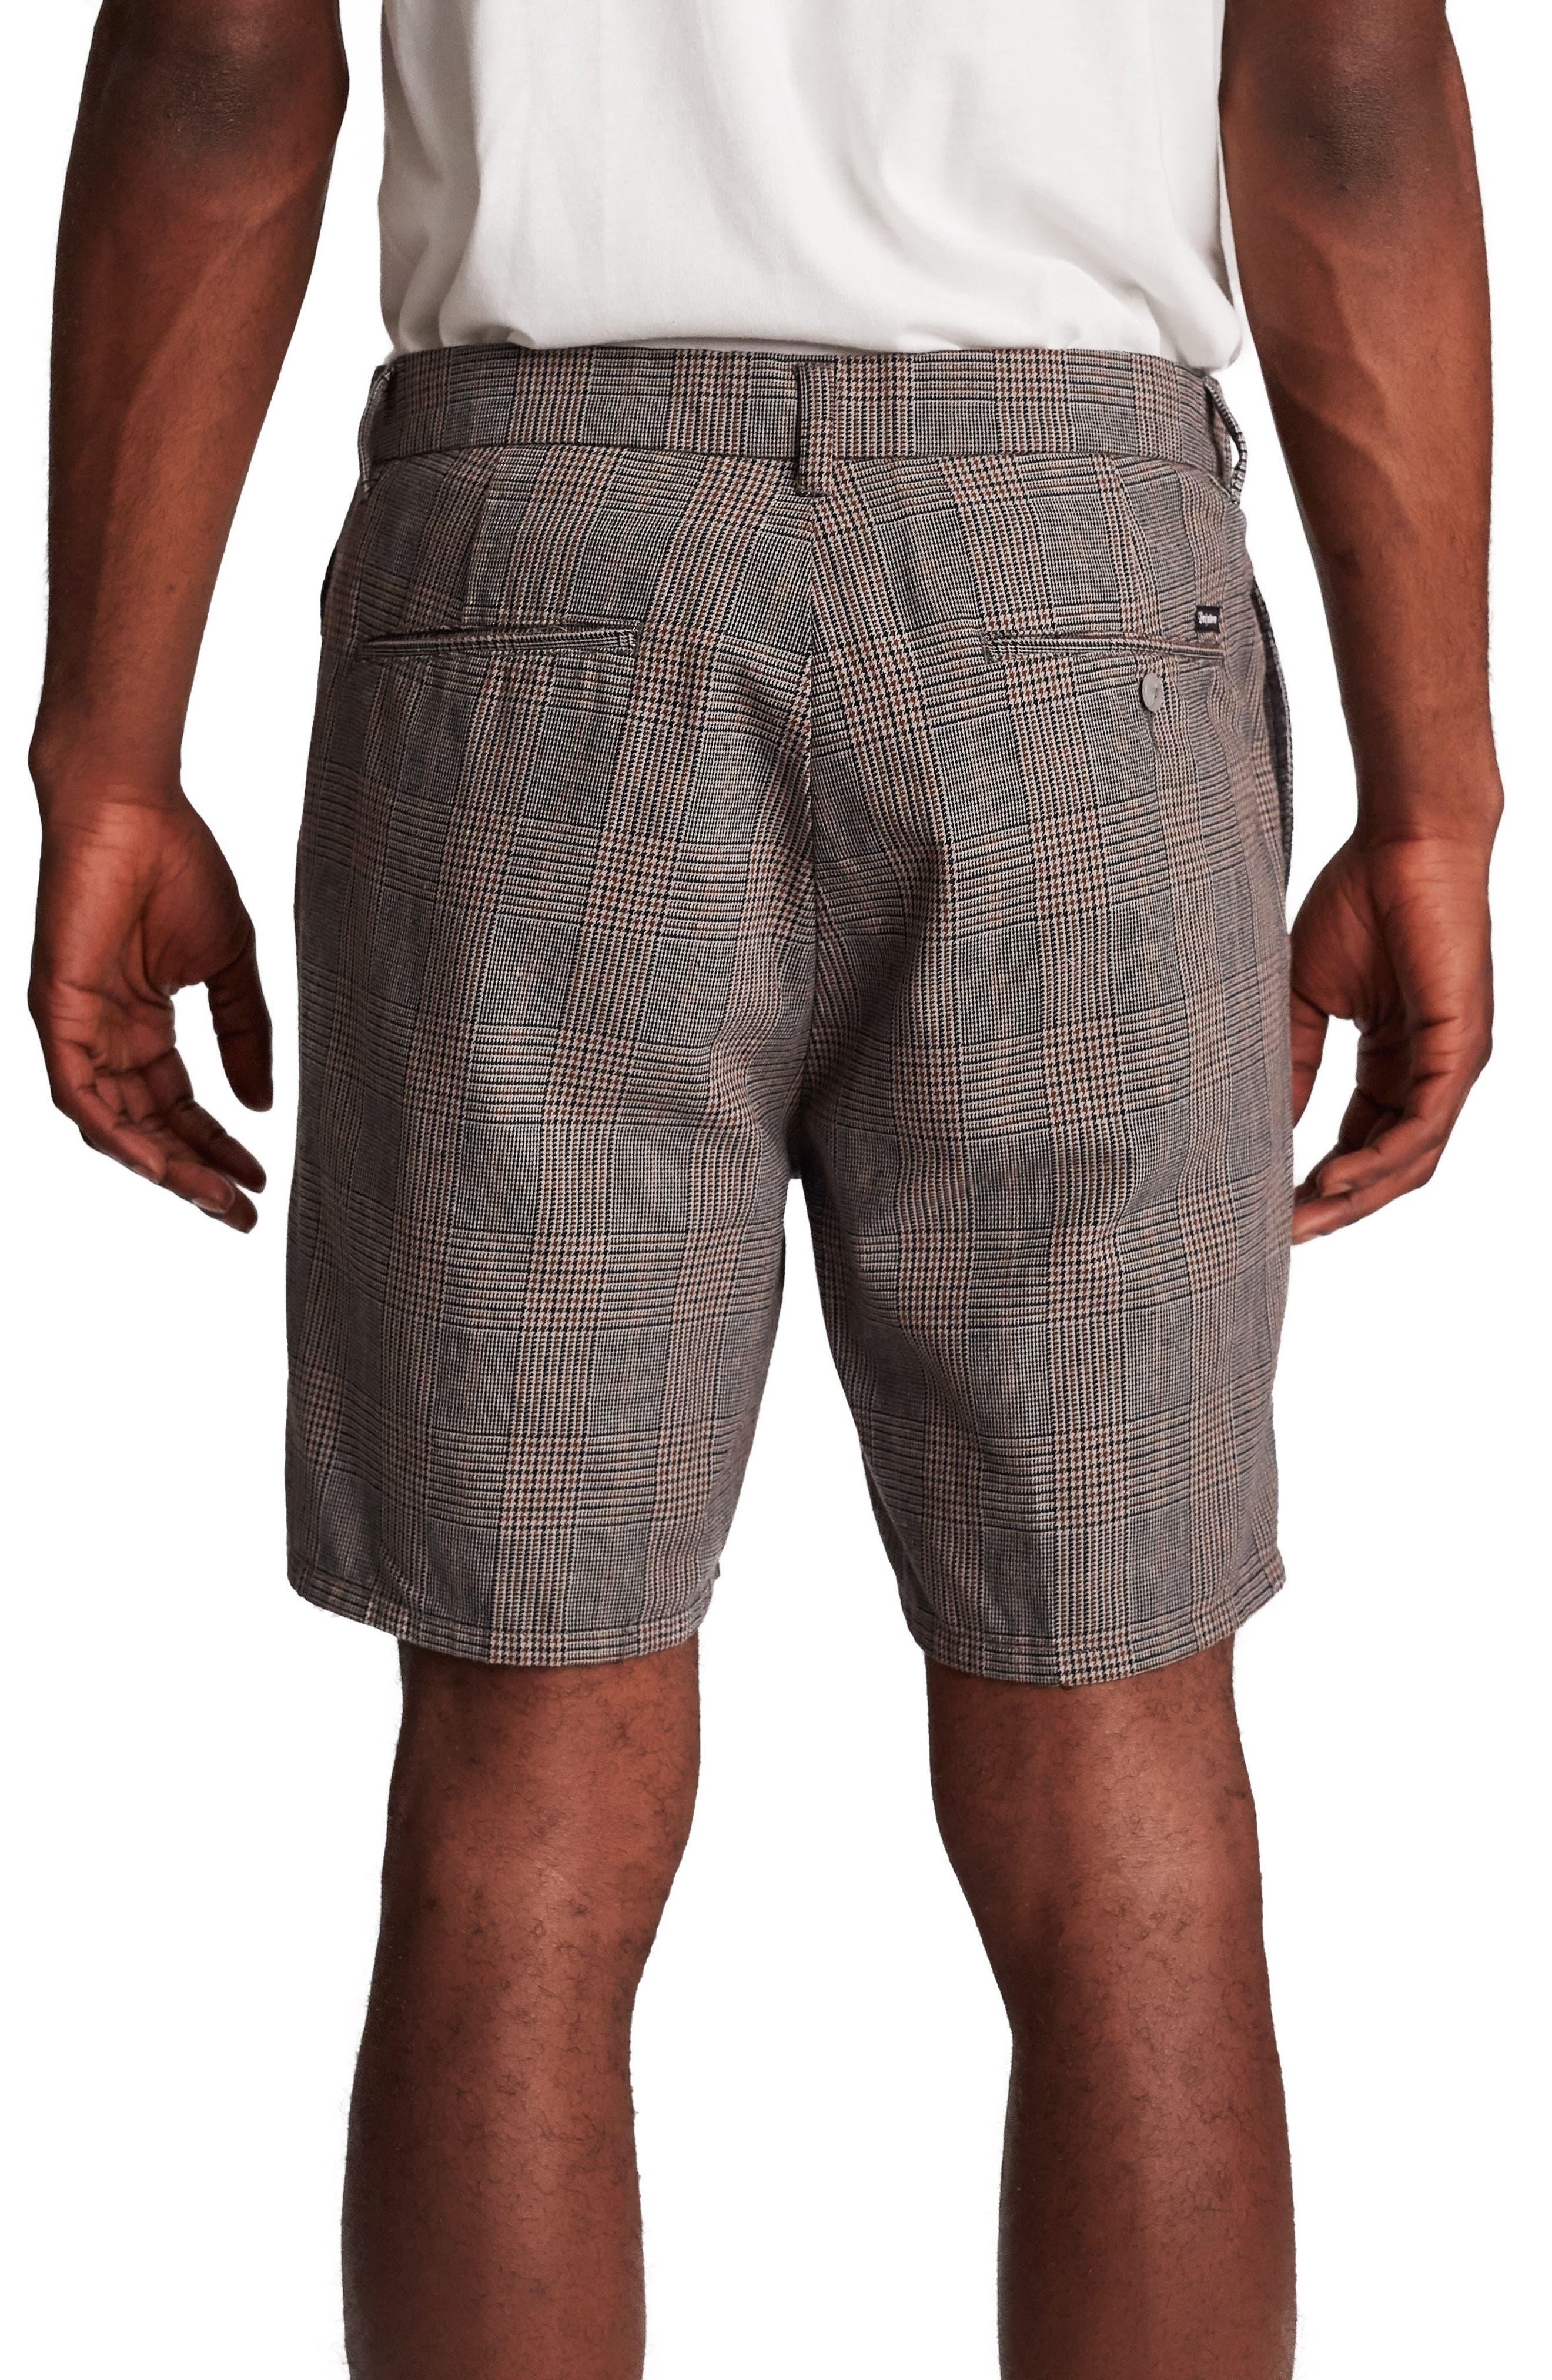 Graduate Slack Shorts,                             Alternate thumbnail 2, color,                             GREY PLAID